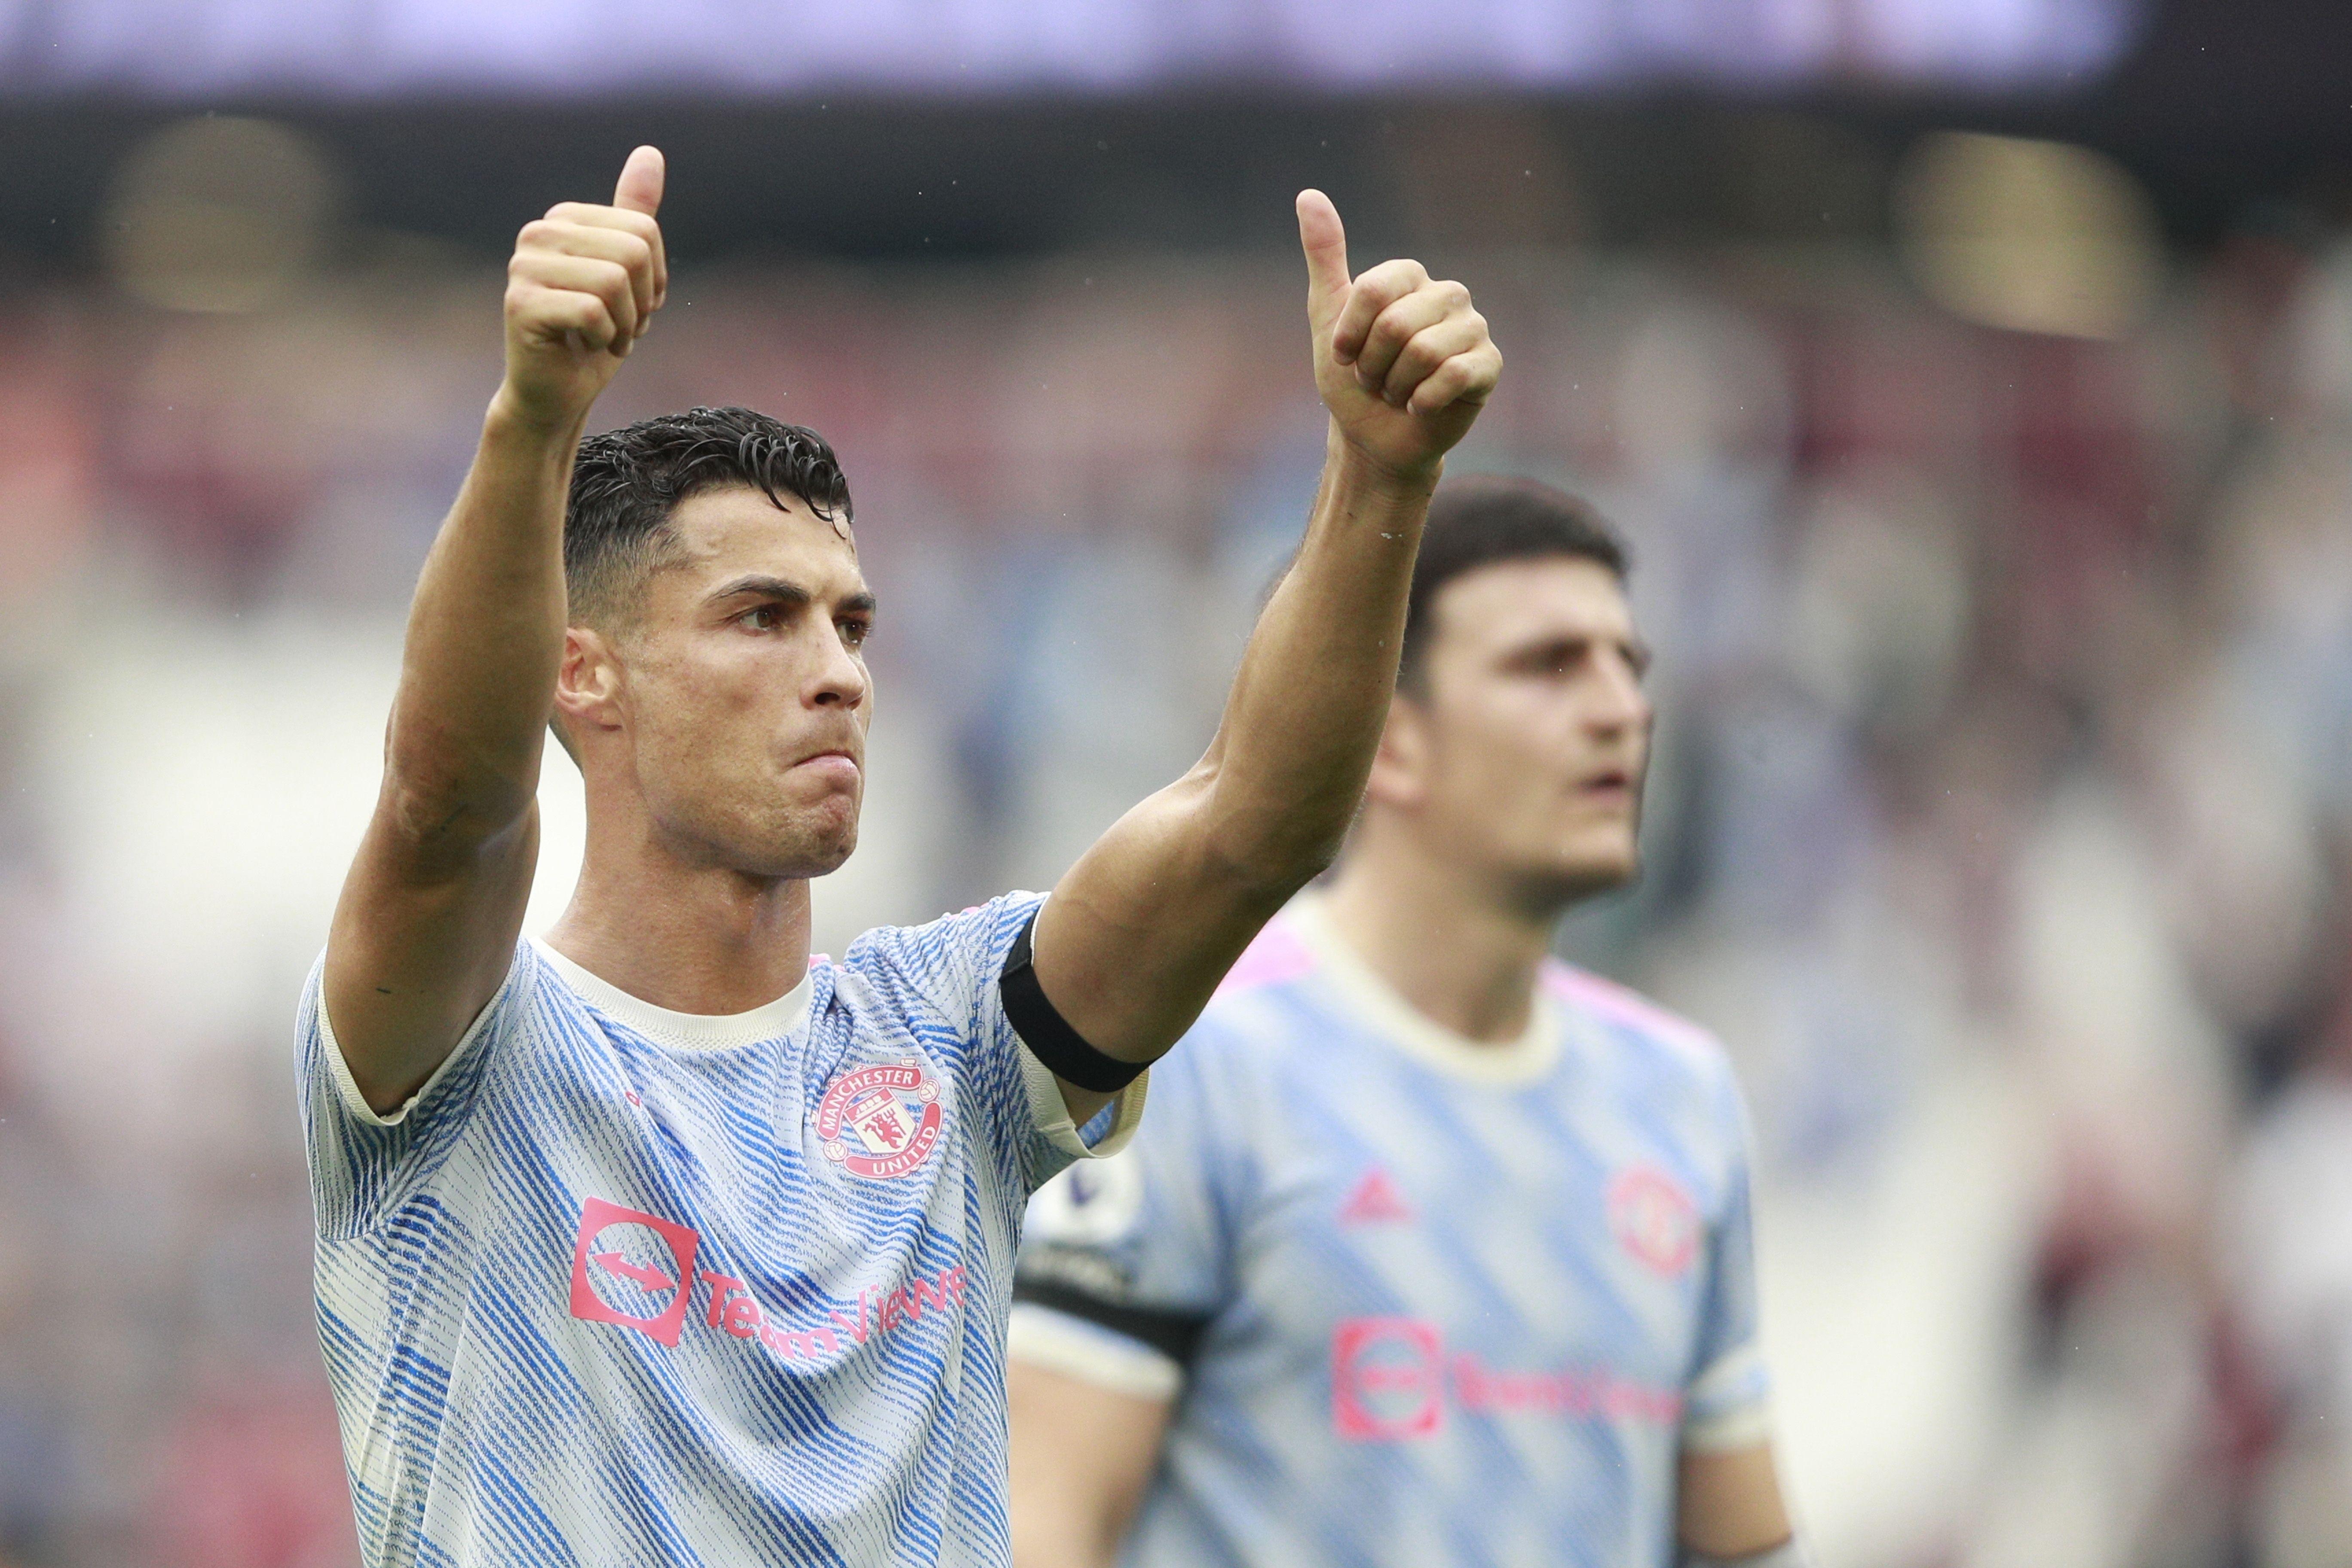 Cristiano lidera remontada de Man United ante West Ham